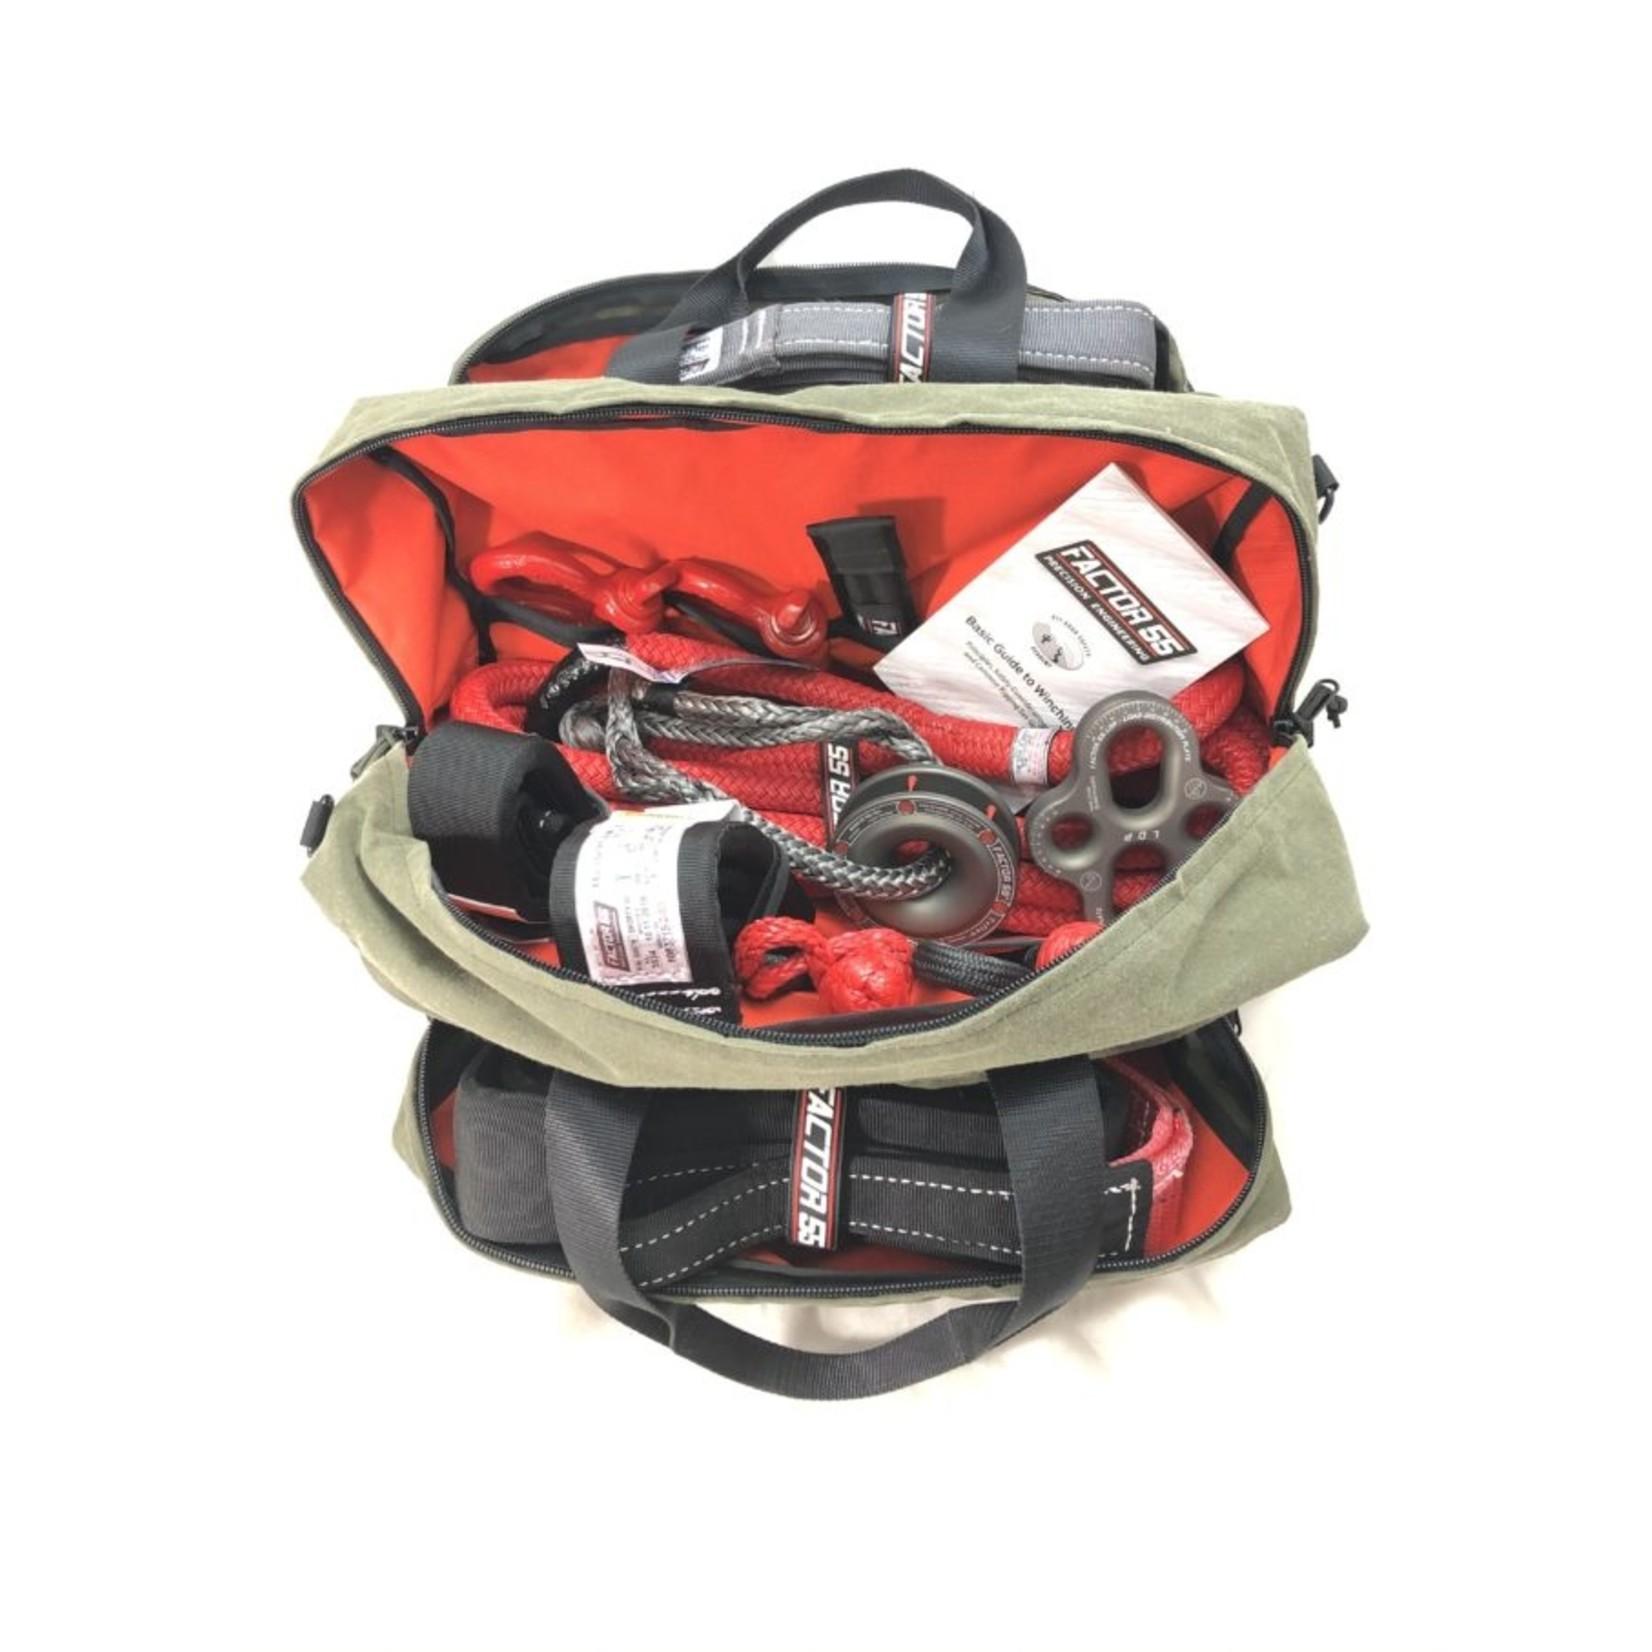 Factor 55 Factor 55 Borah Vehicle Recovery Kit